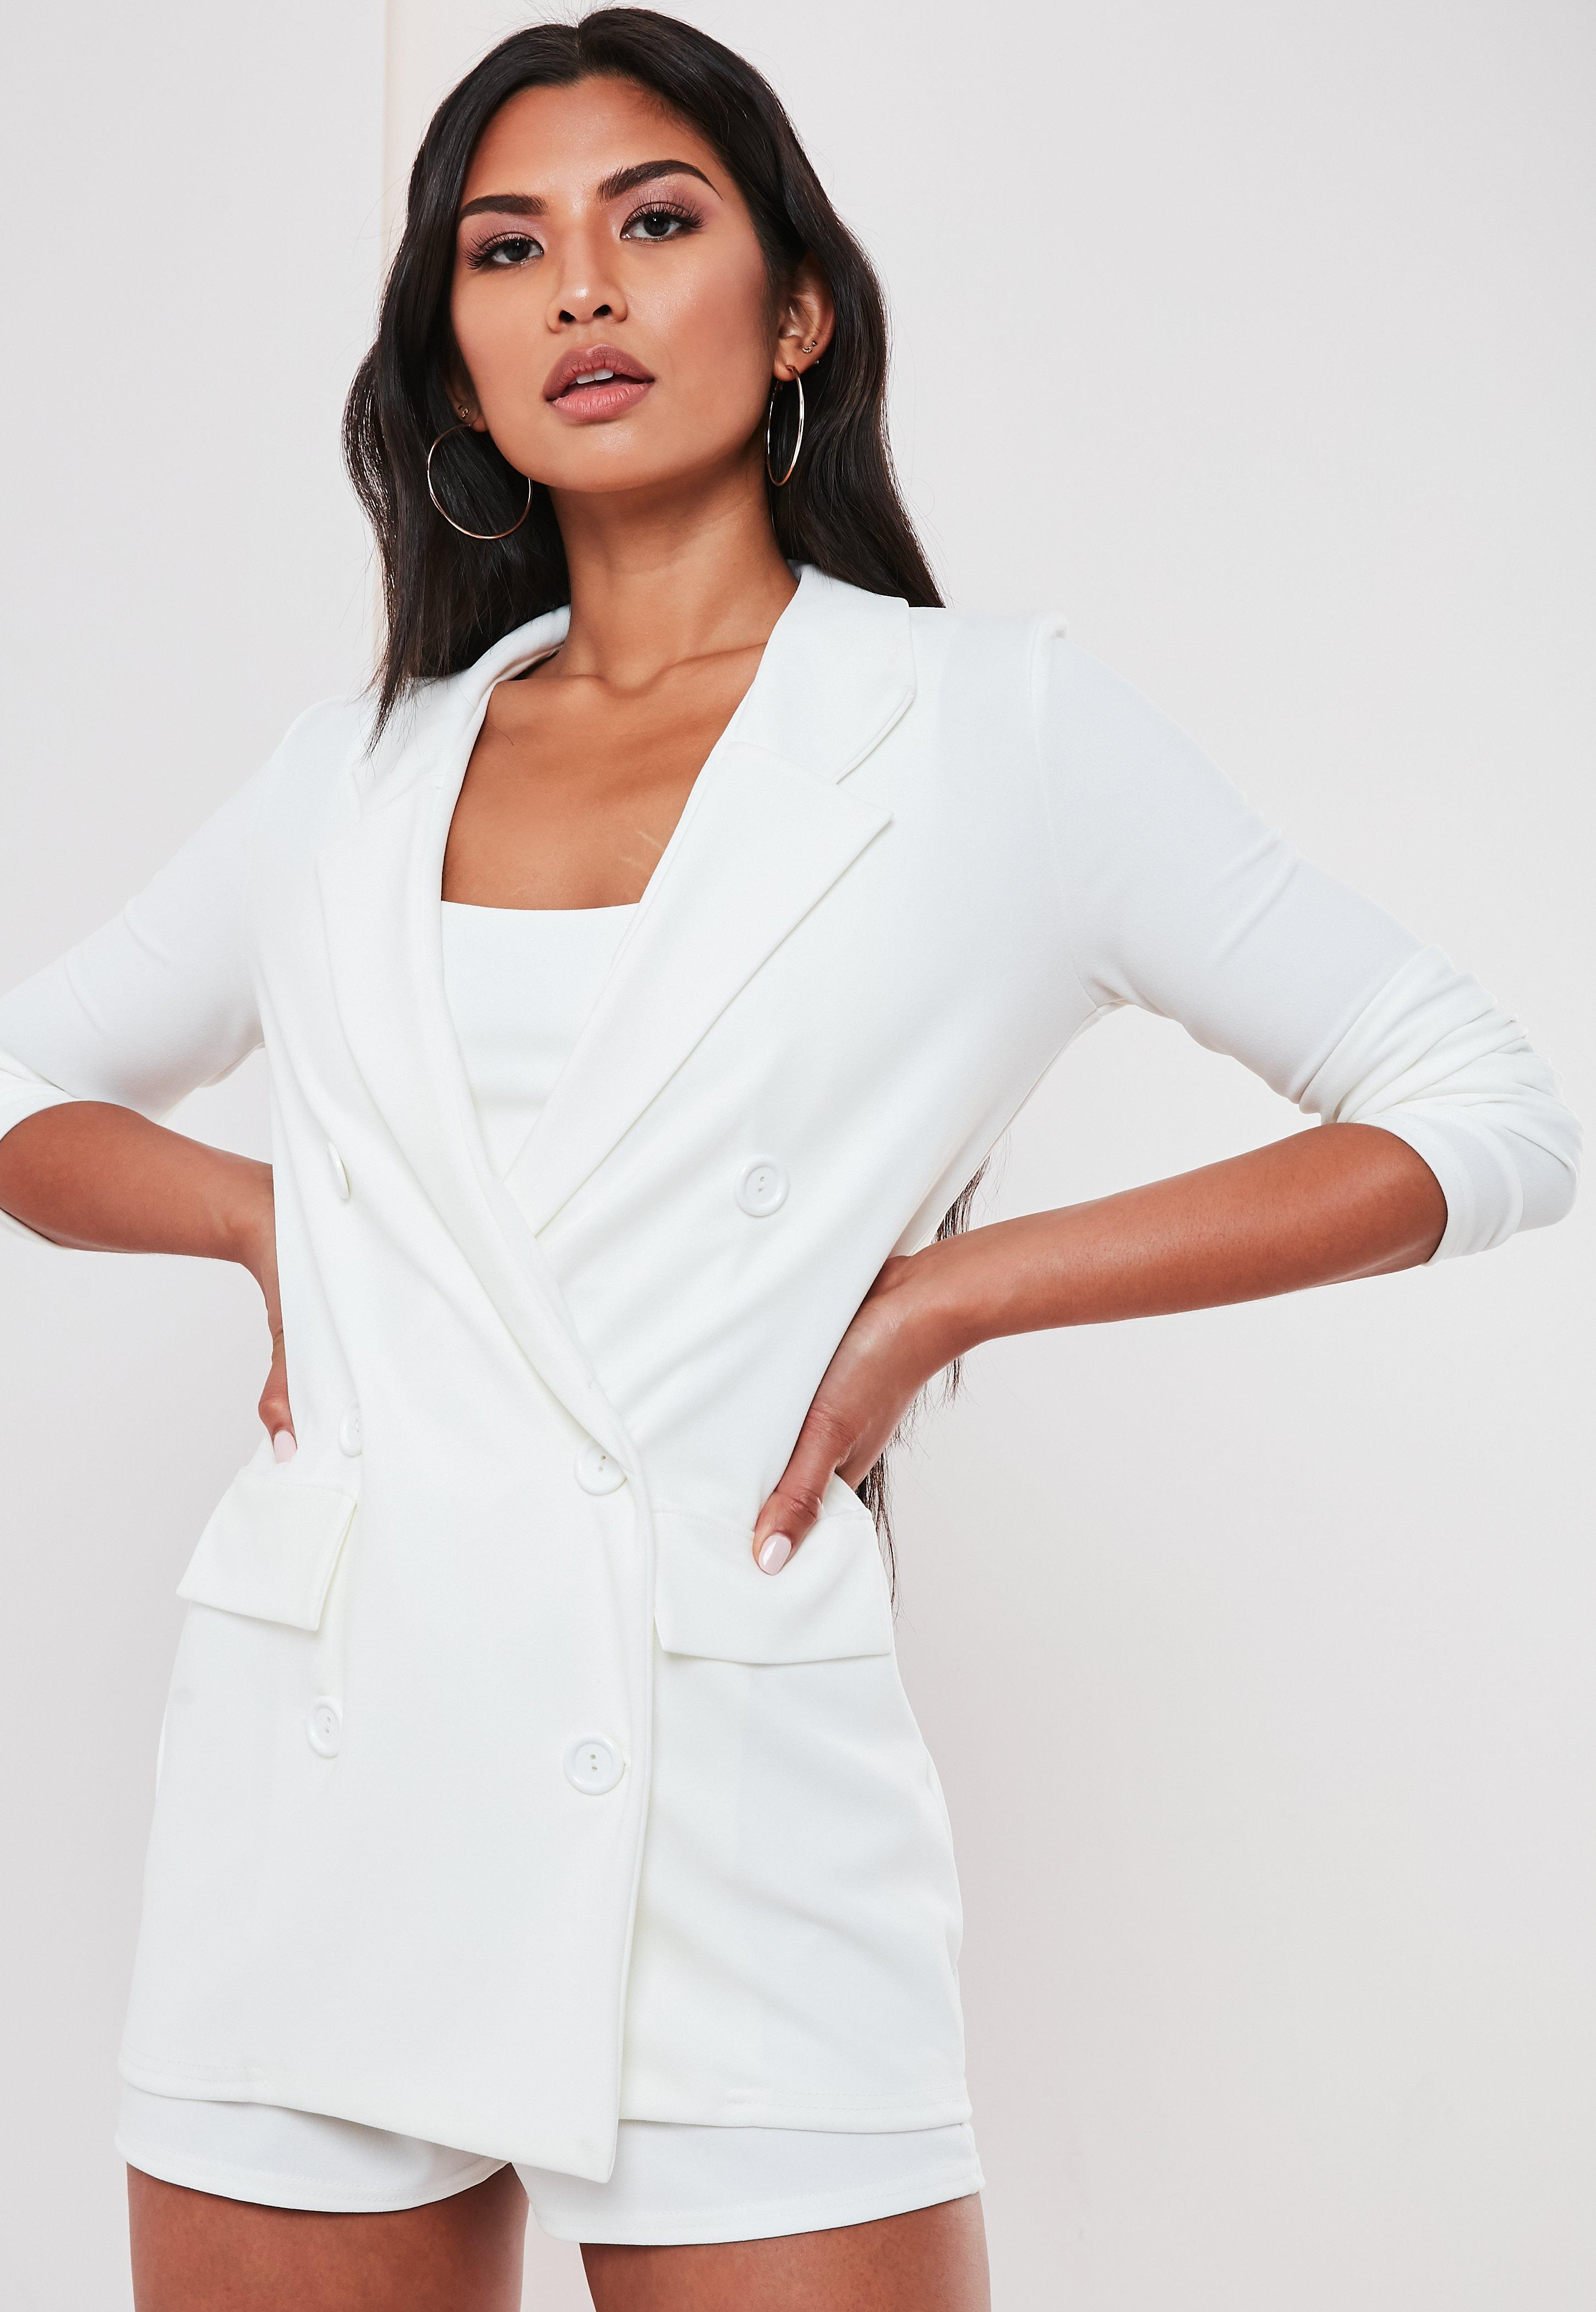 297d45e4e17c Blazers for Women - Shop Smart & Tweed Blazers UK - Missguided